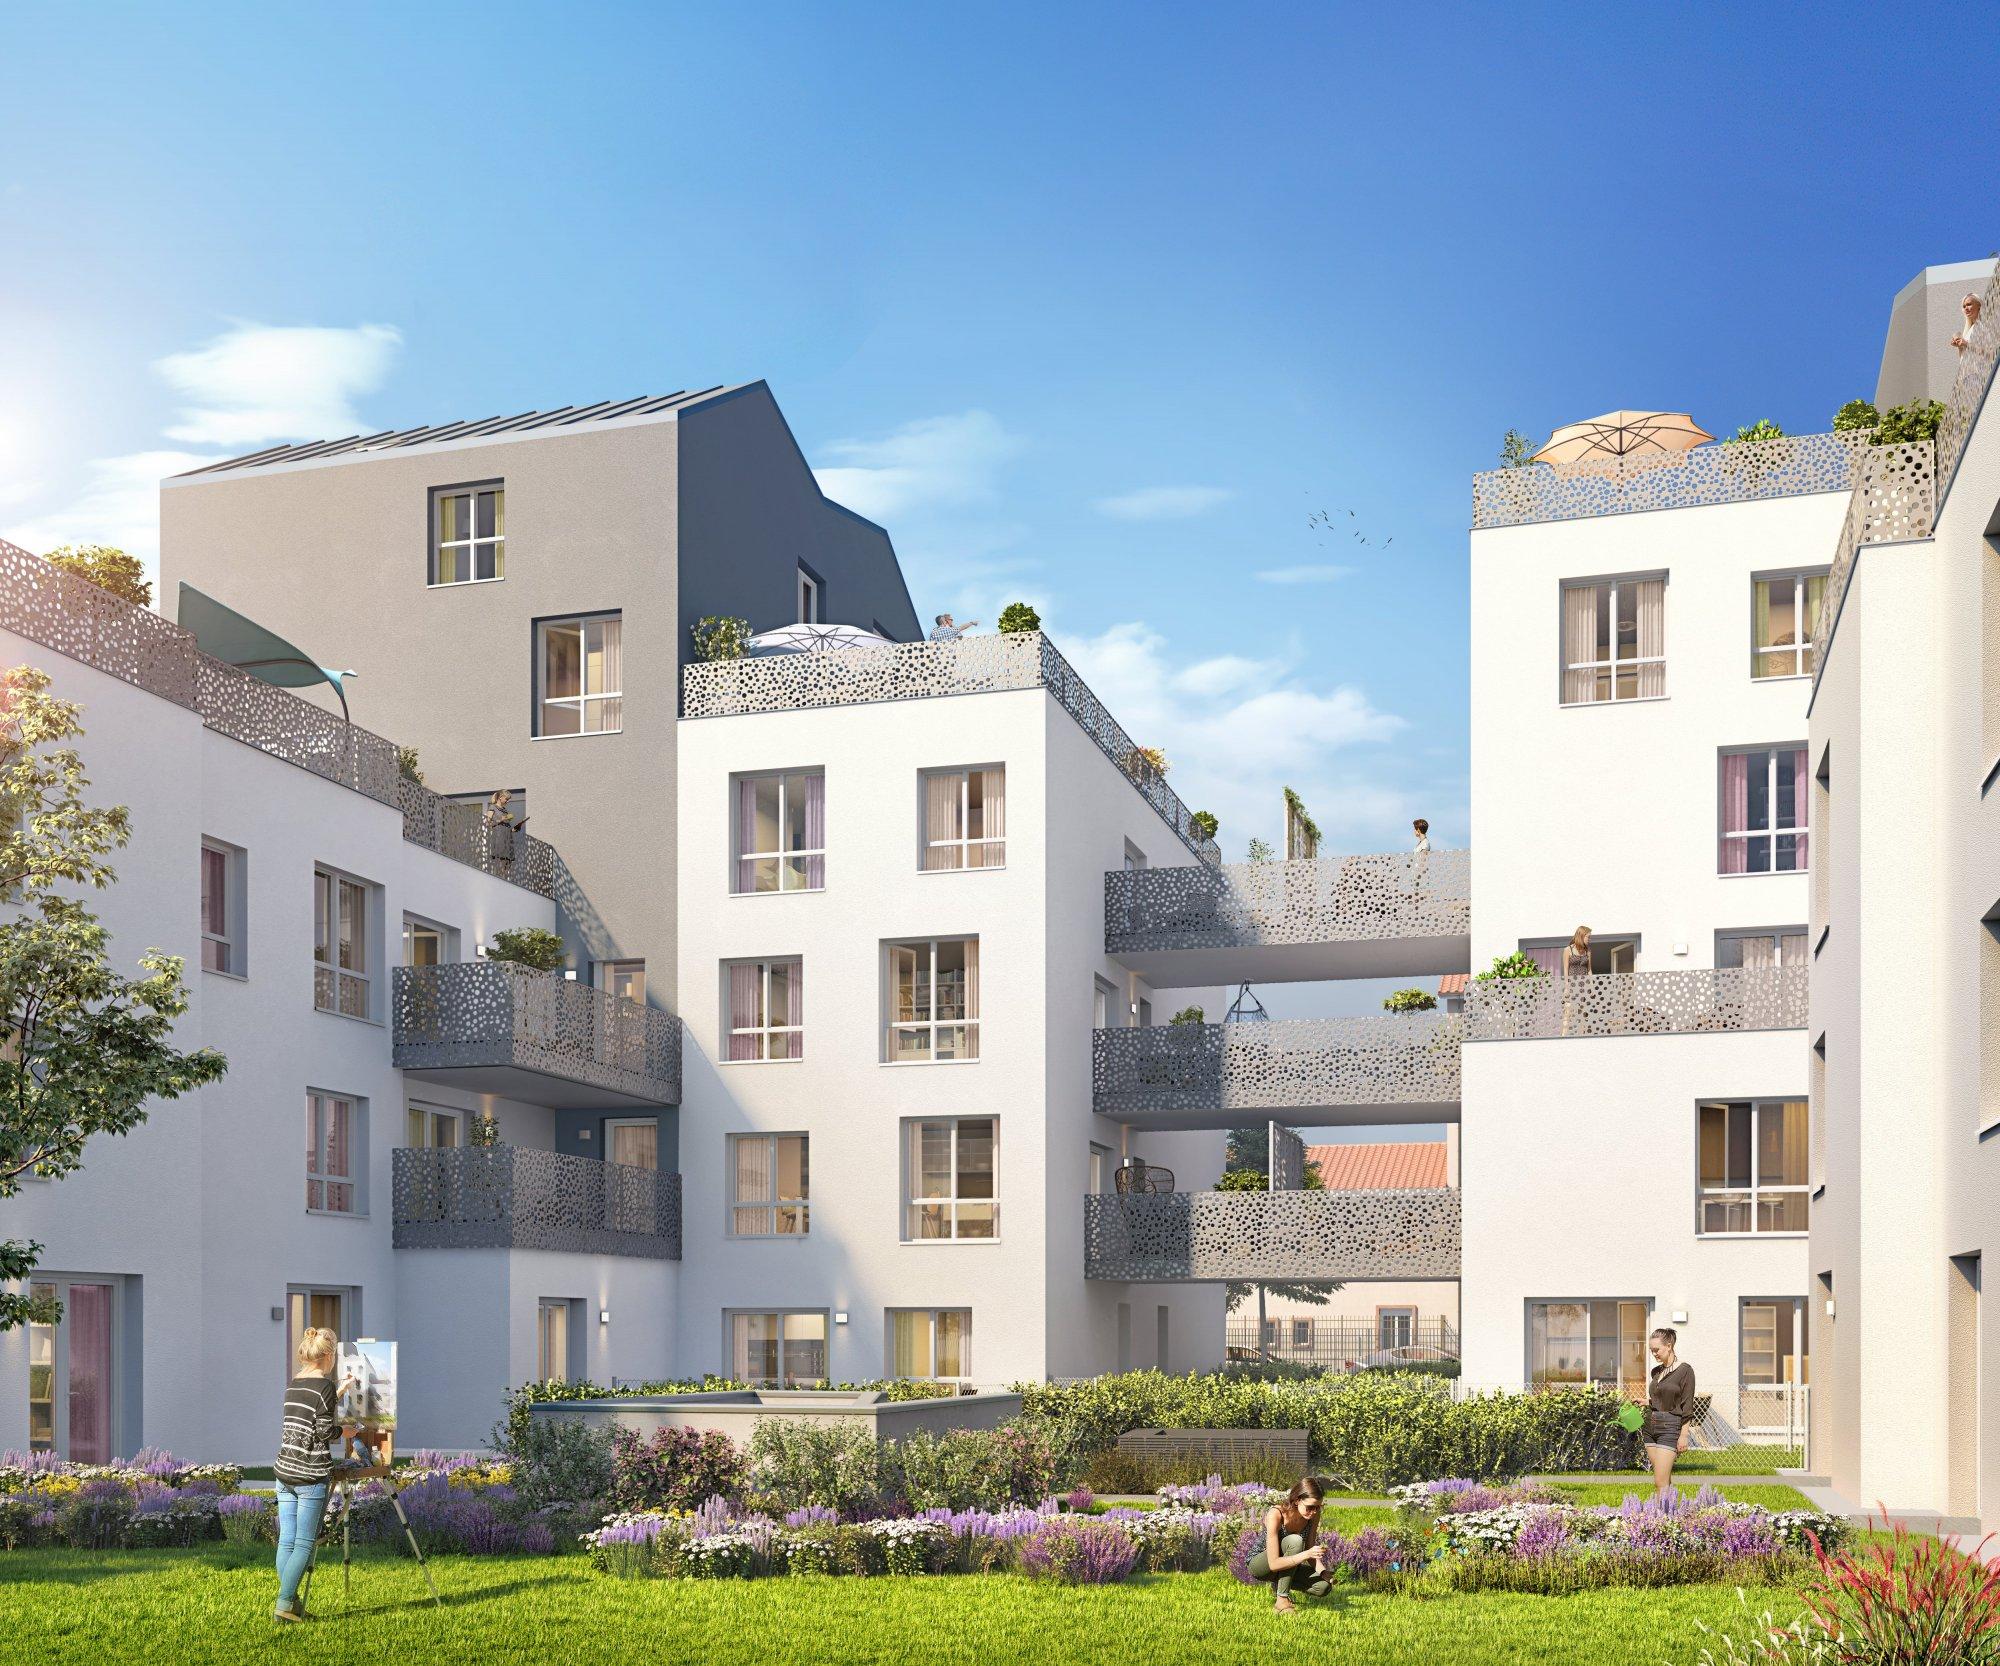 Programme immobilier Villeurbanne (69100) Résidence de standing ICA8